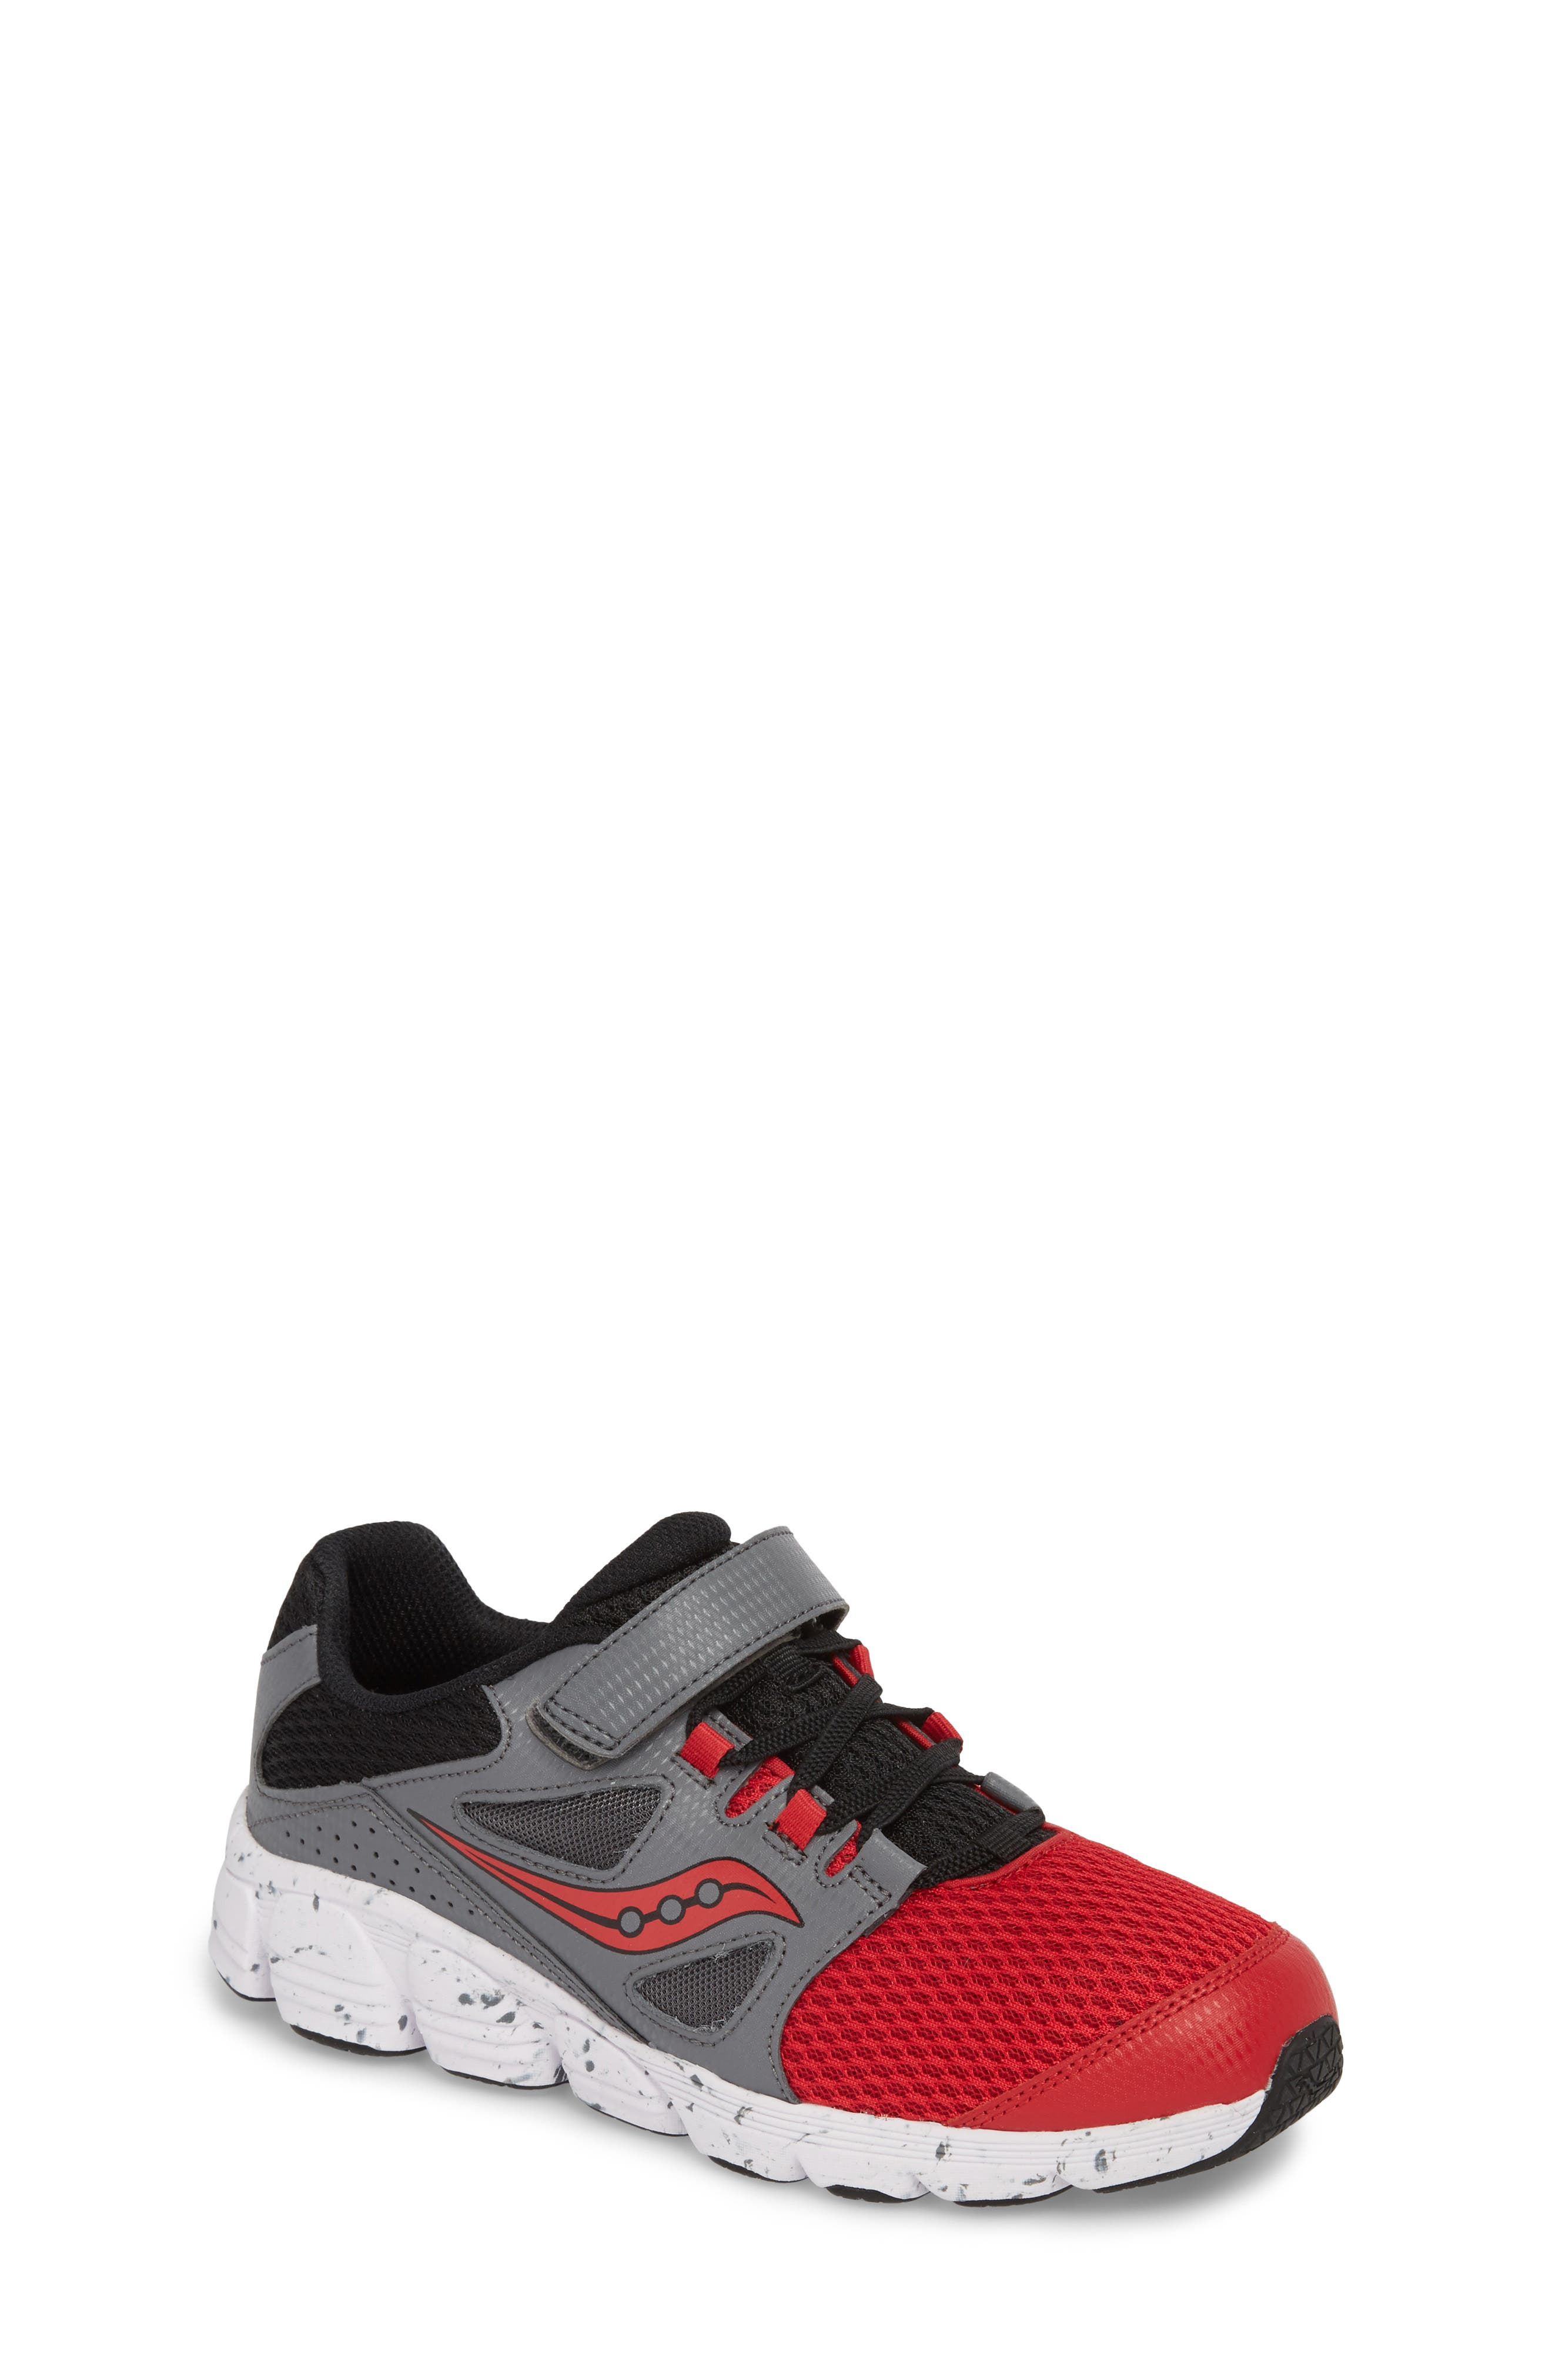 Kotaro 4 Sneaker,                             Main thumbnail 1, color,                             Red/ Grey